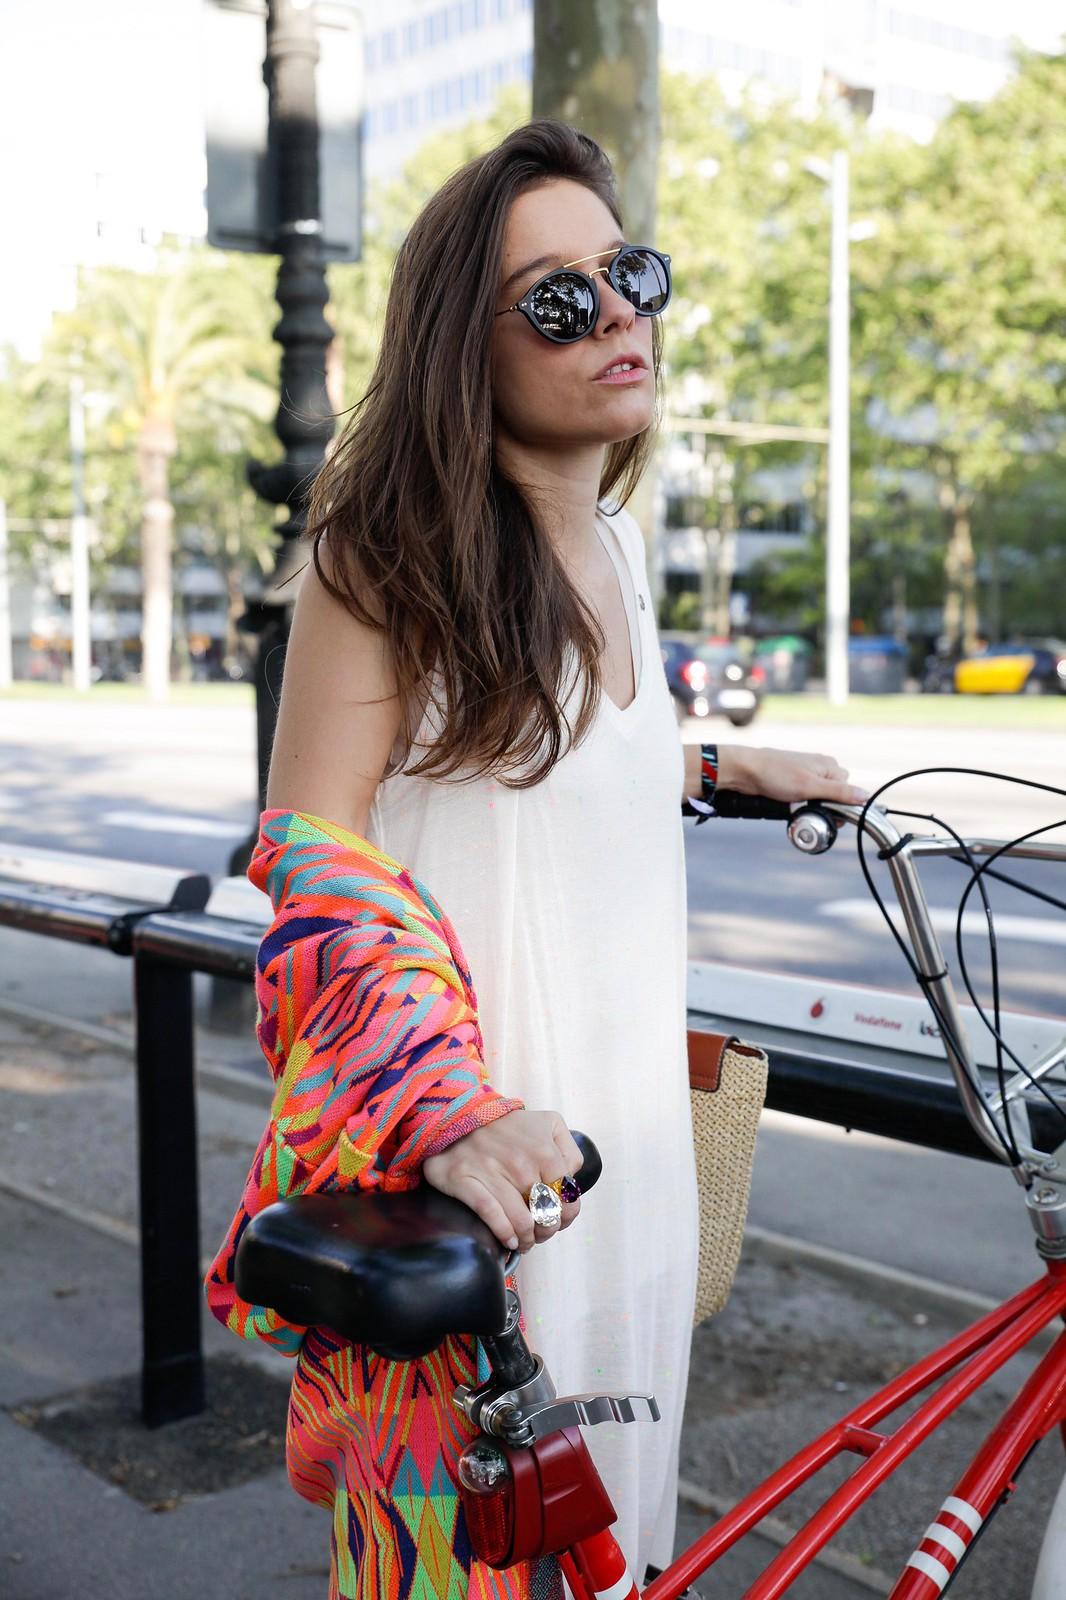 017_kimono_look_street_style_barcelona_theguestgirl_pepe_moll_ruga_caroline_svedbom_kapten_son